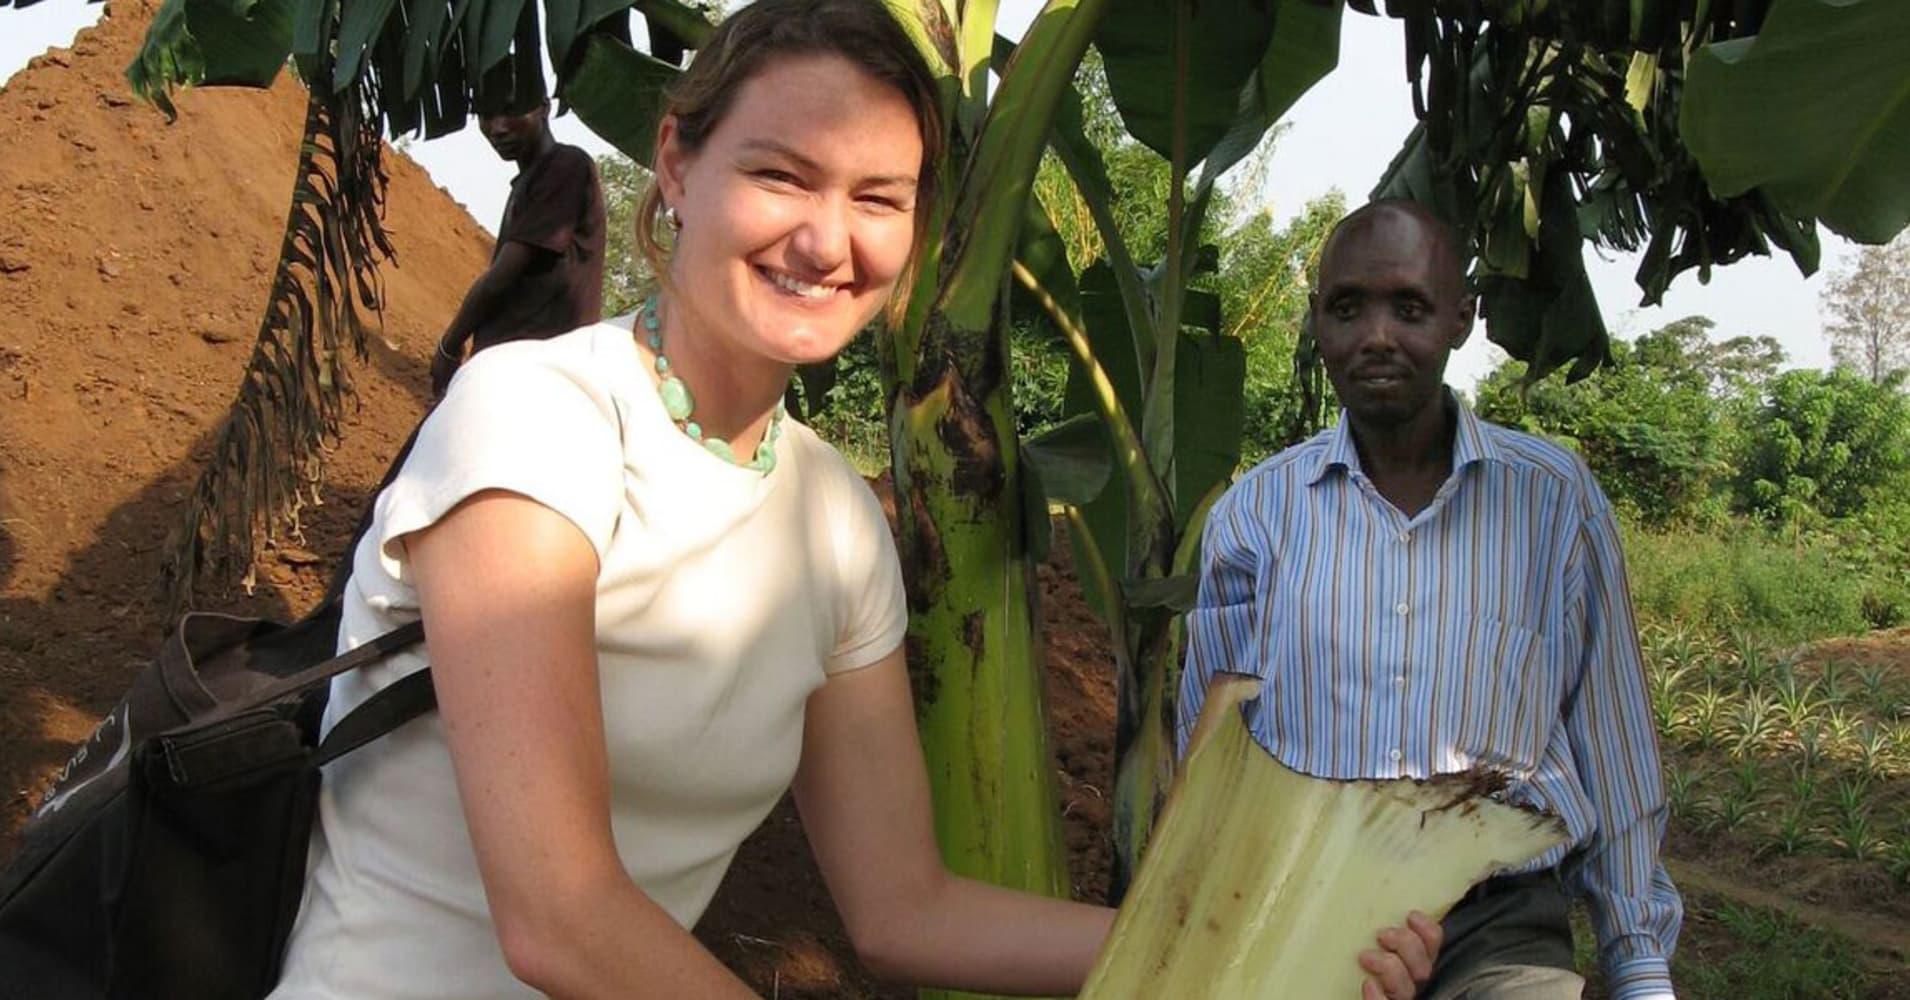 Elizabeth Scharpf holding a banana tree trunk.